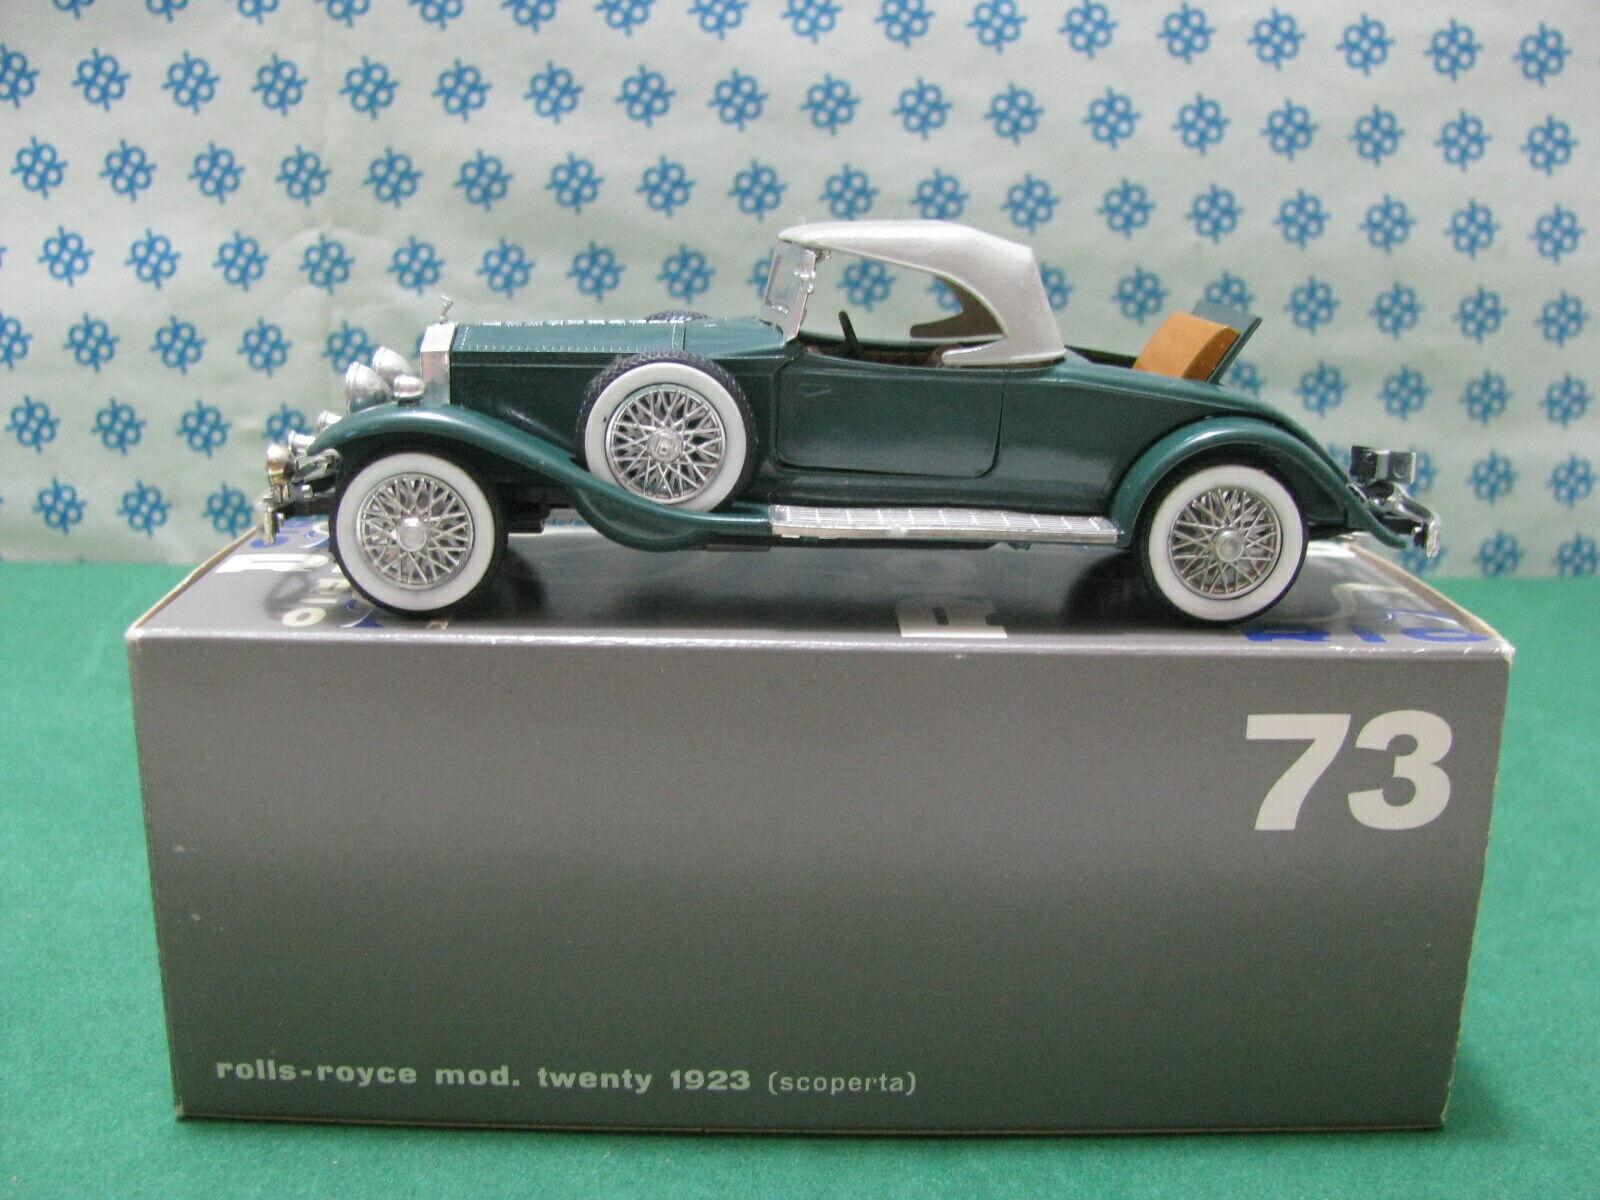 Vintage -  ROLLS-ROYCE 1931   -  1 1 1 43  Rio n°73  Mint Box 16c308